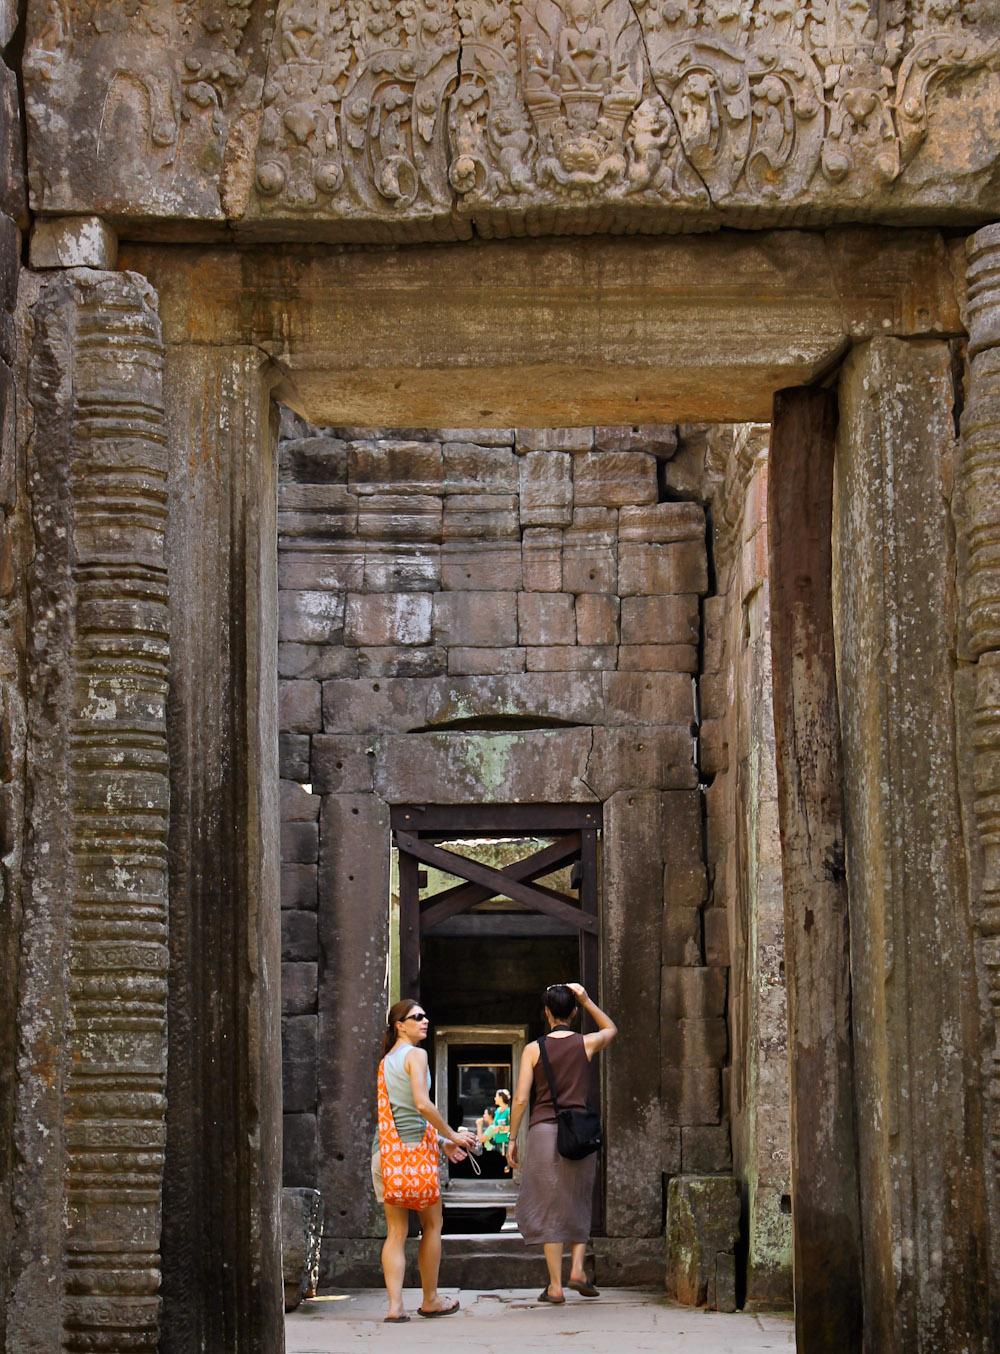 Preah Khan Siem Reap Cambodia-5